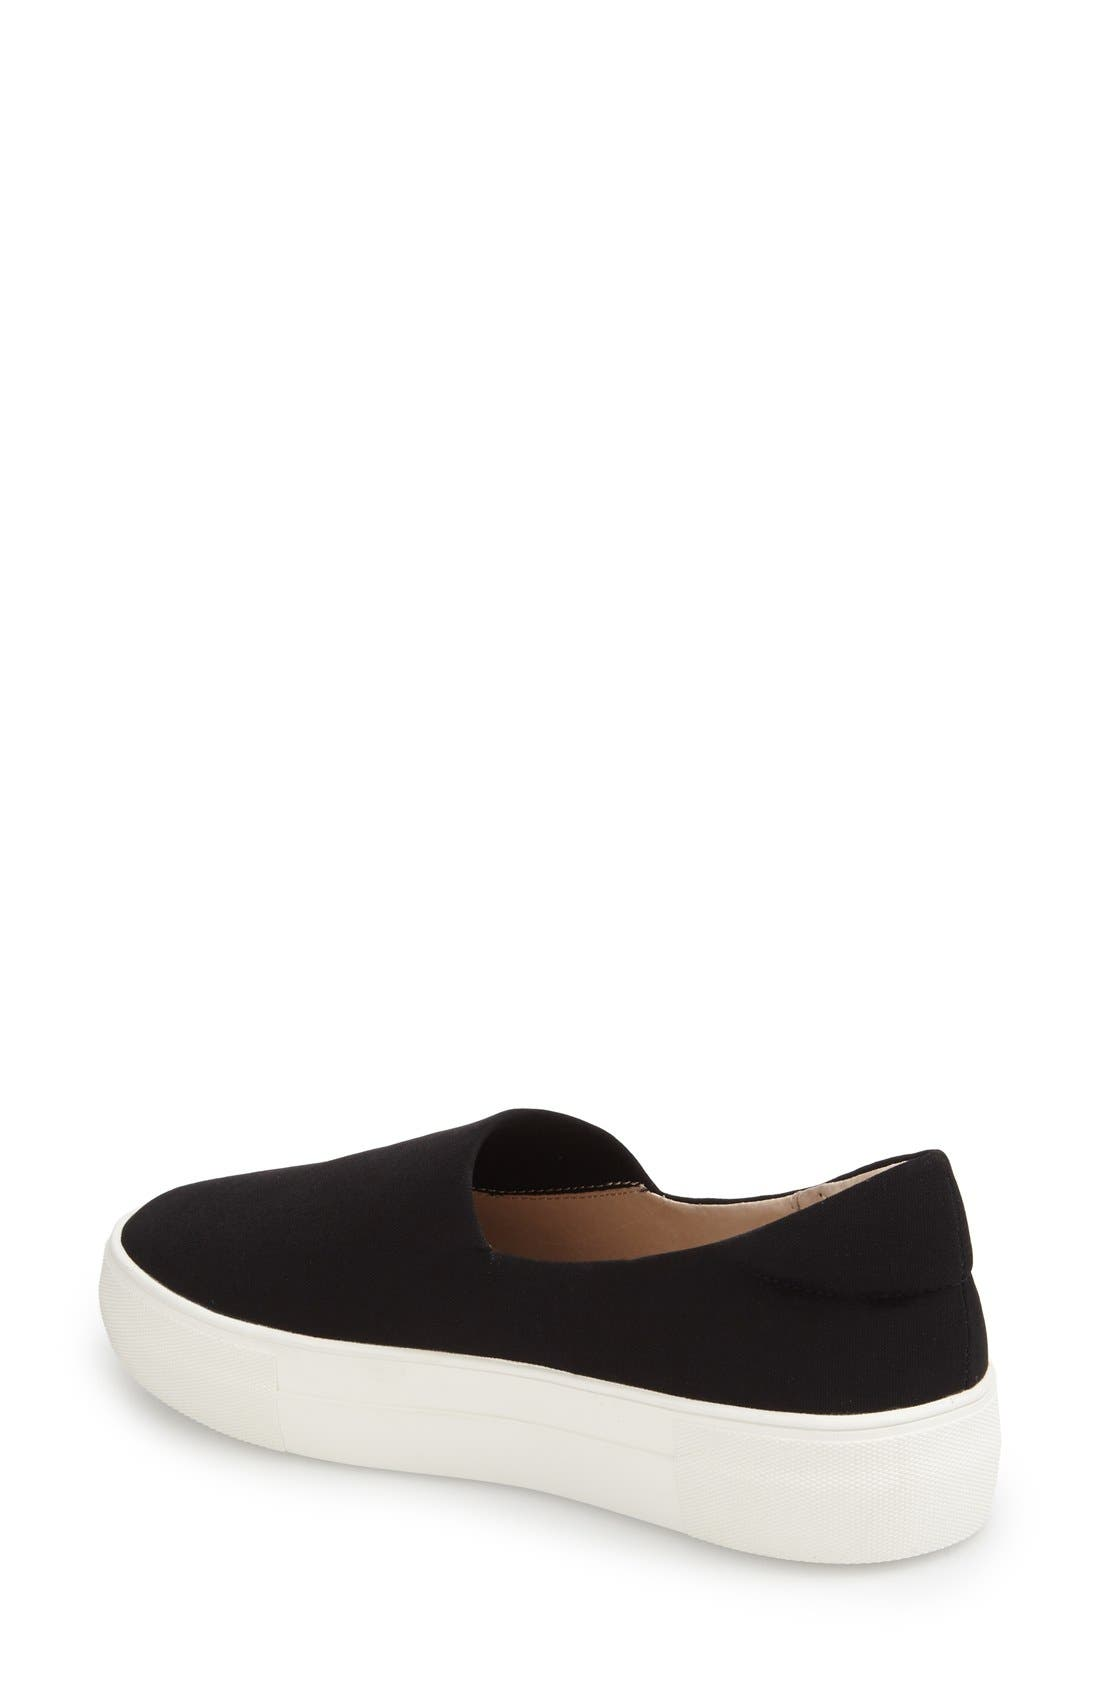 'Ariana' Platform Sneaker,                             Alternate thumbnail 2, color,                             Black Fabric